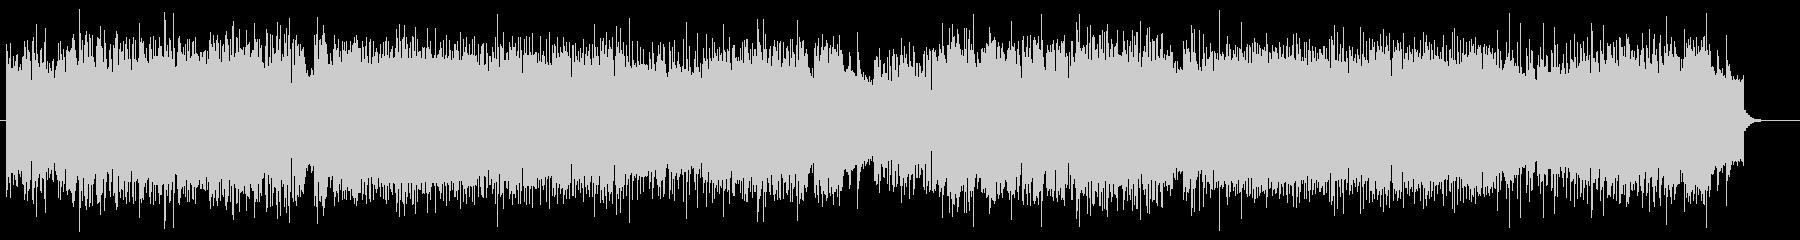 HEAVYMETAL「DEATH」306の未再生の波形